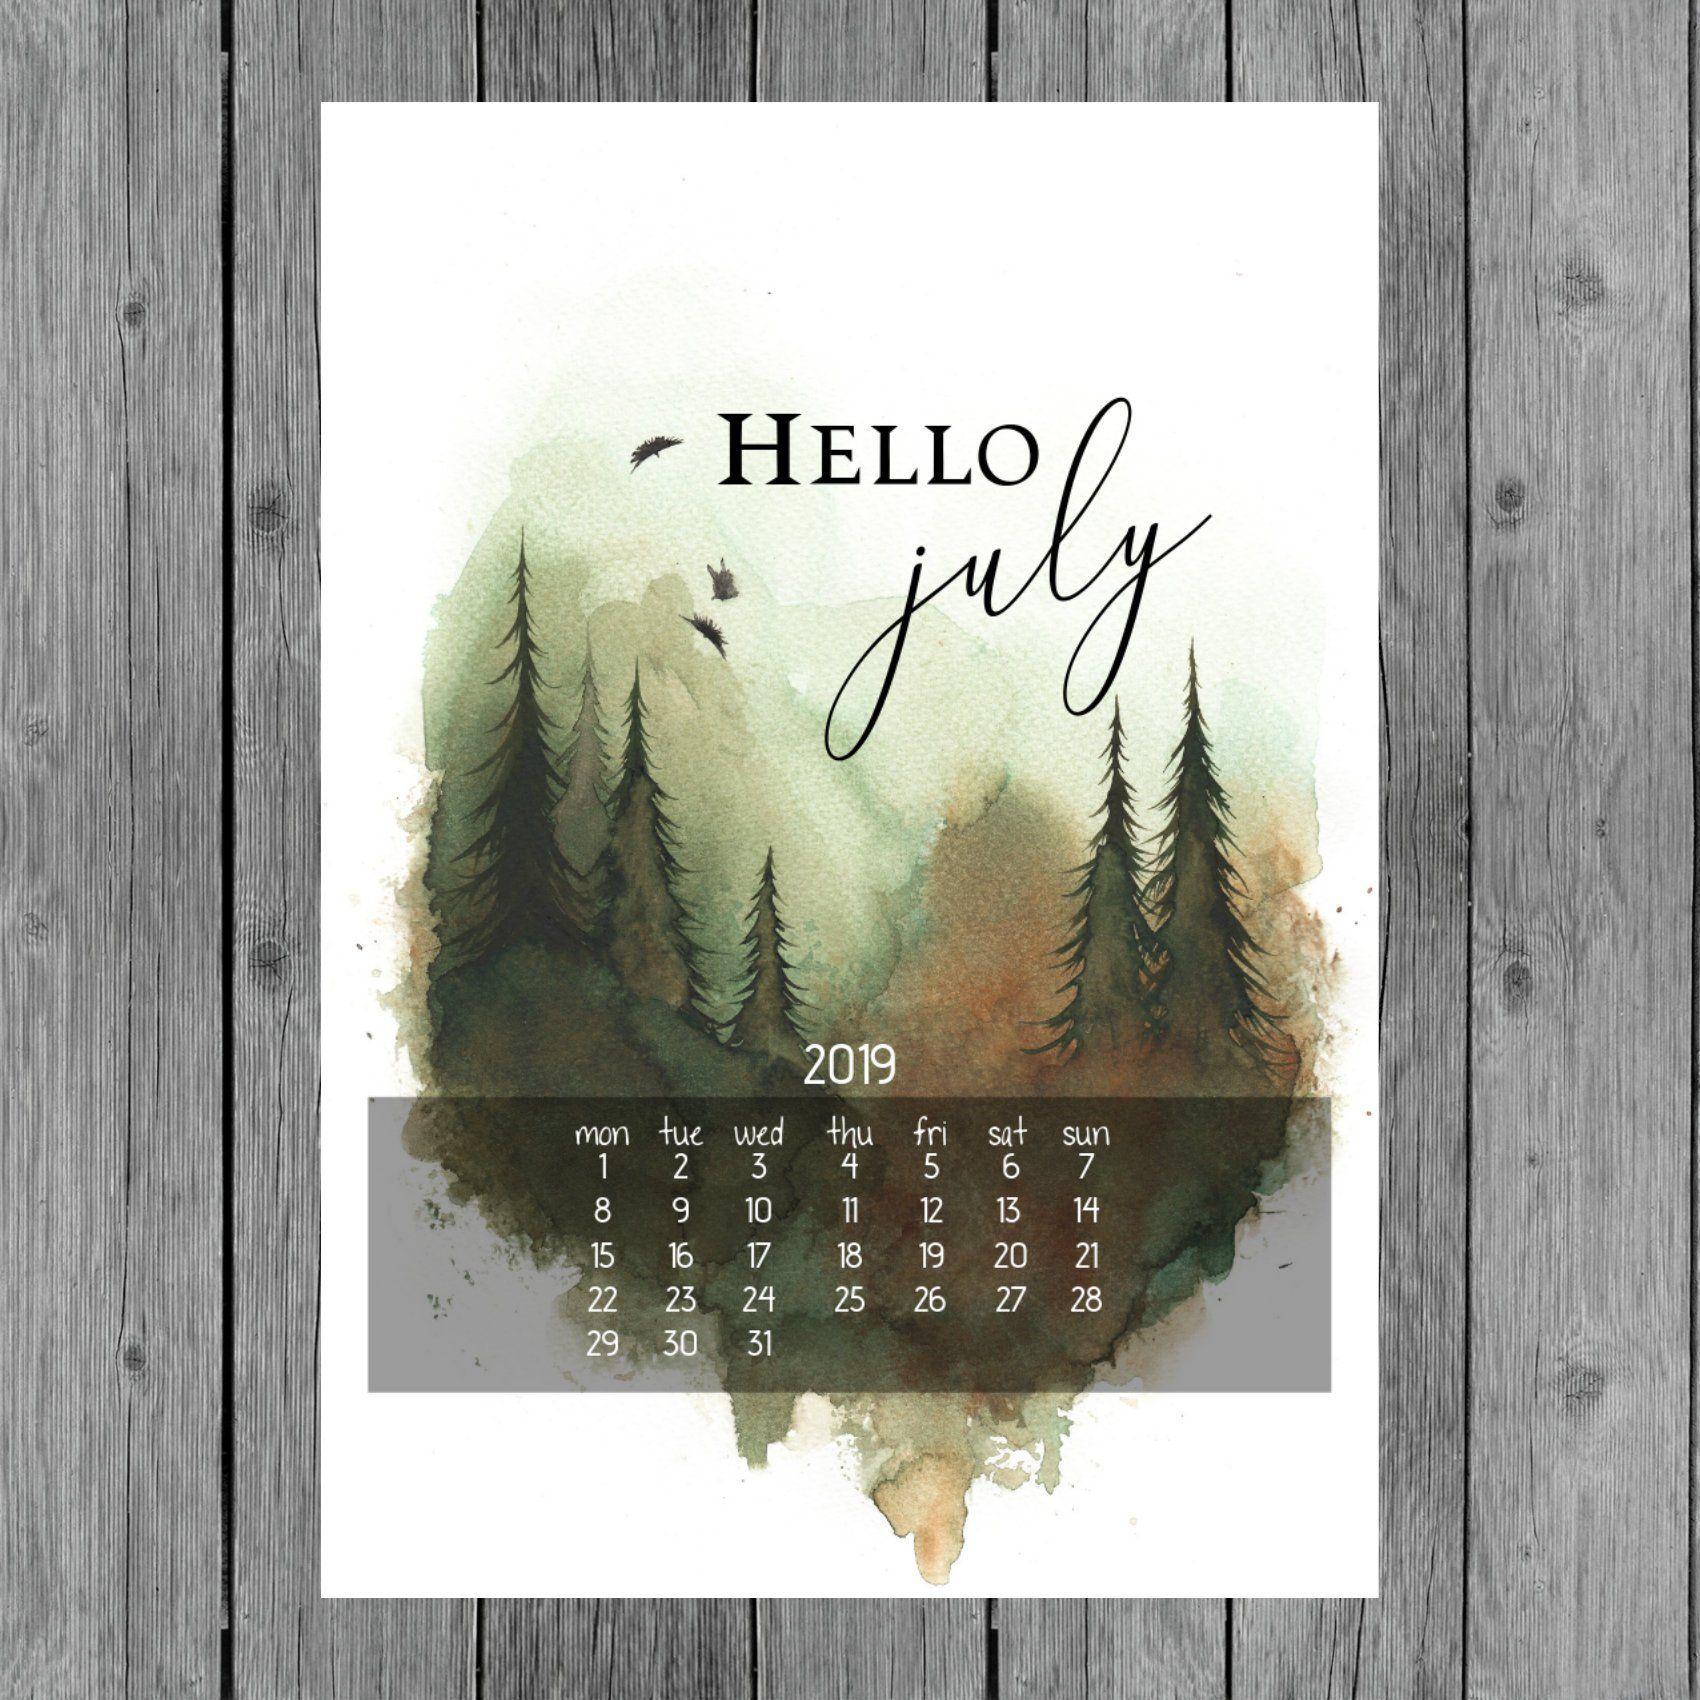 Printable Calendar For July 2019 Wall Calendar Printable Pdf A4